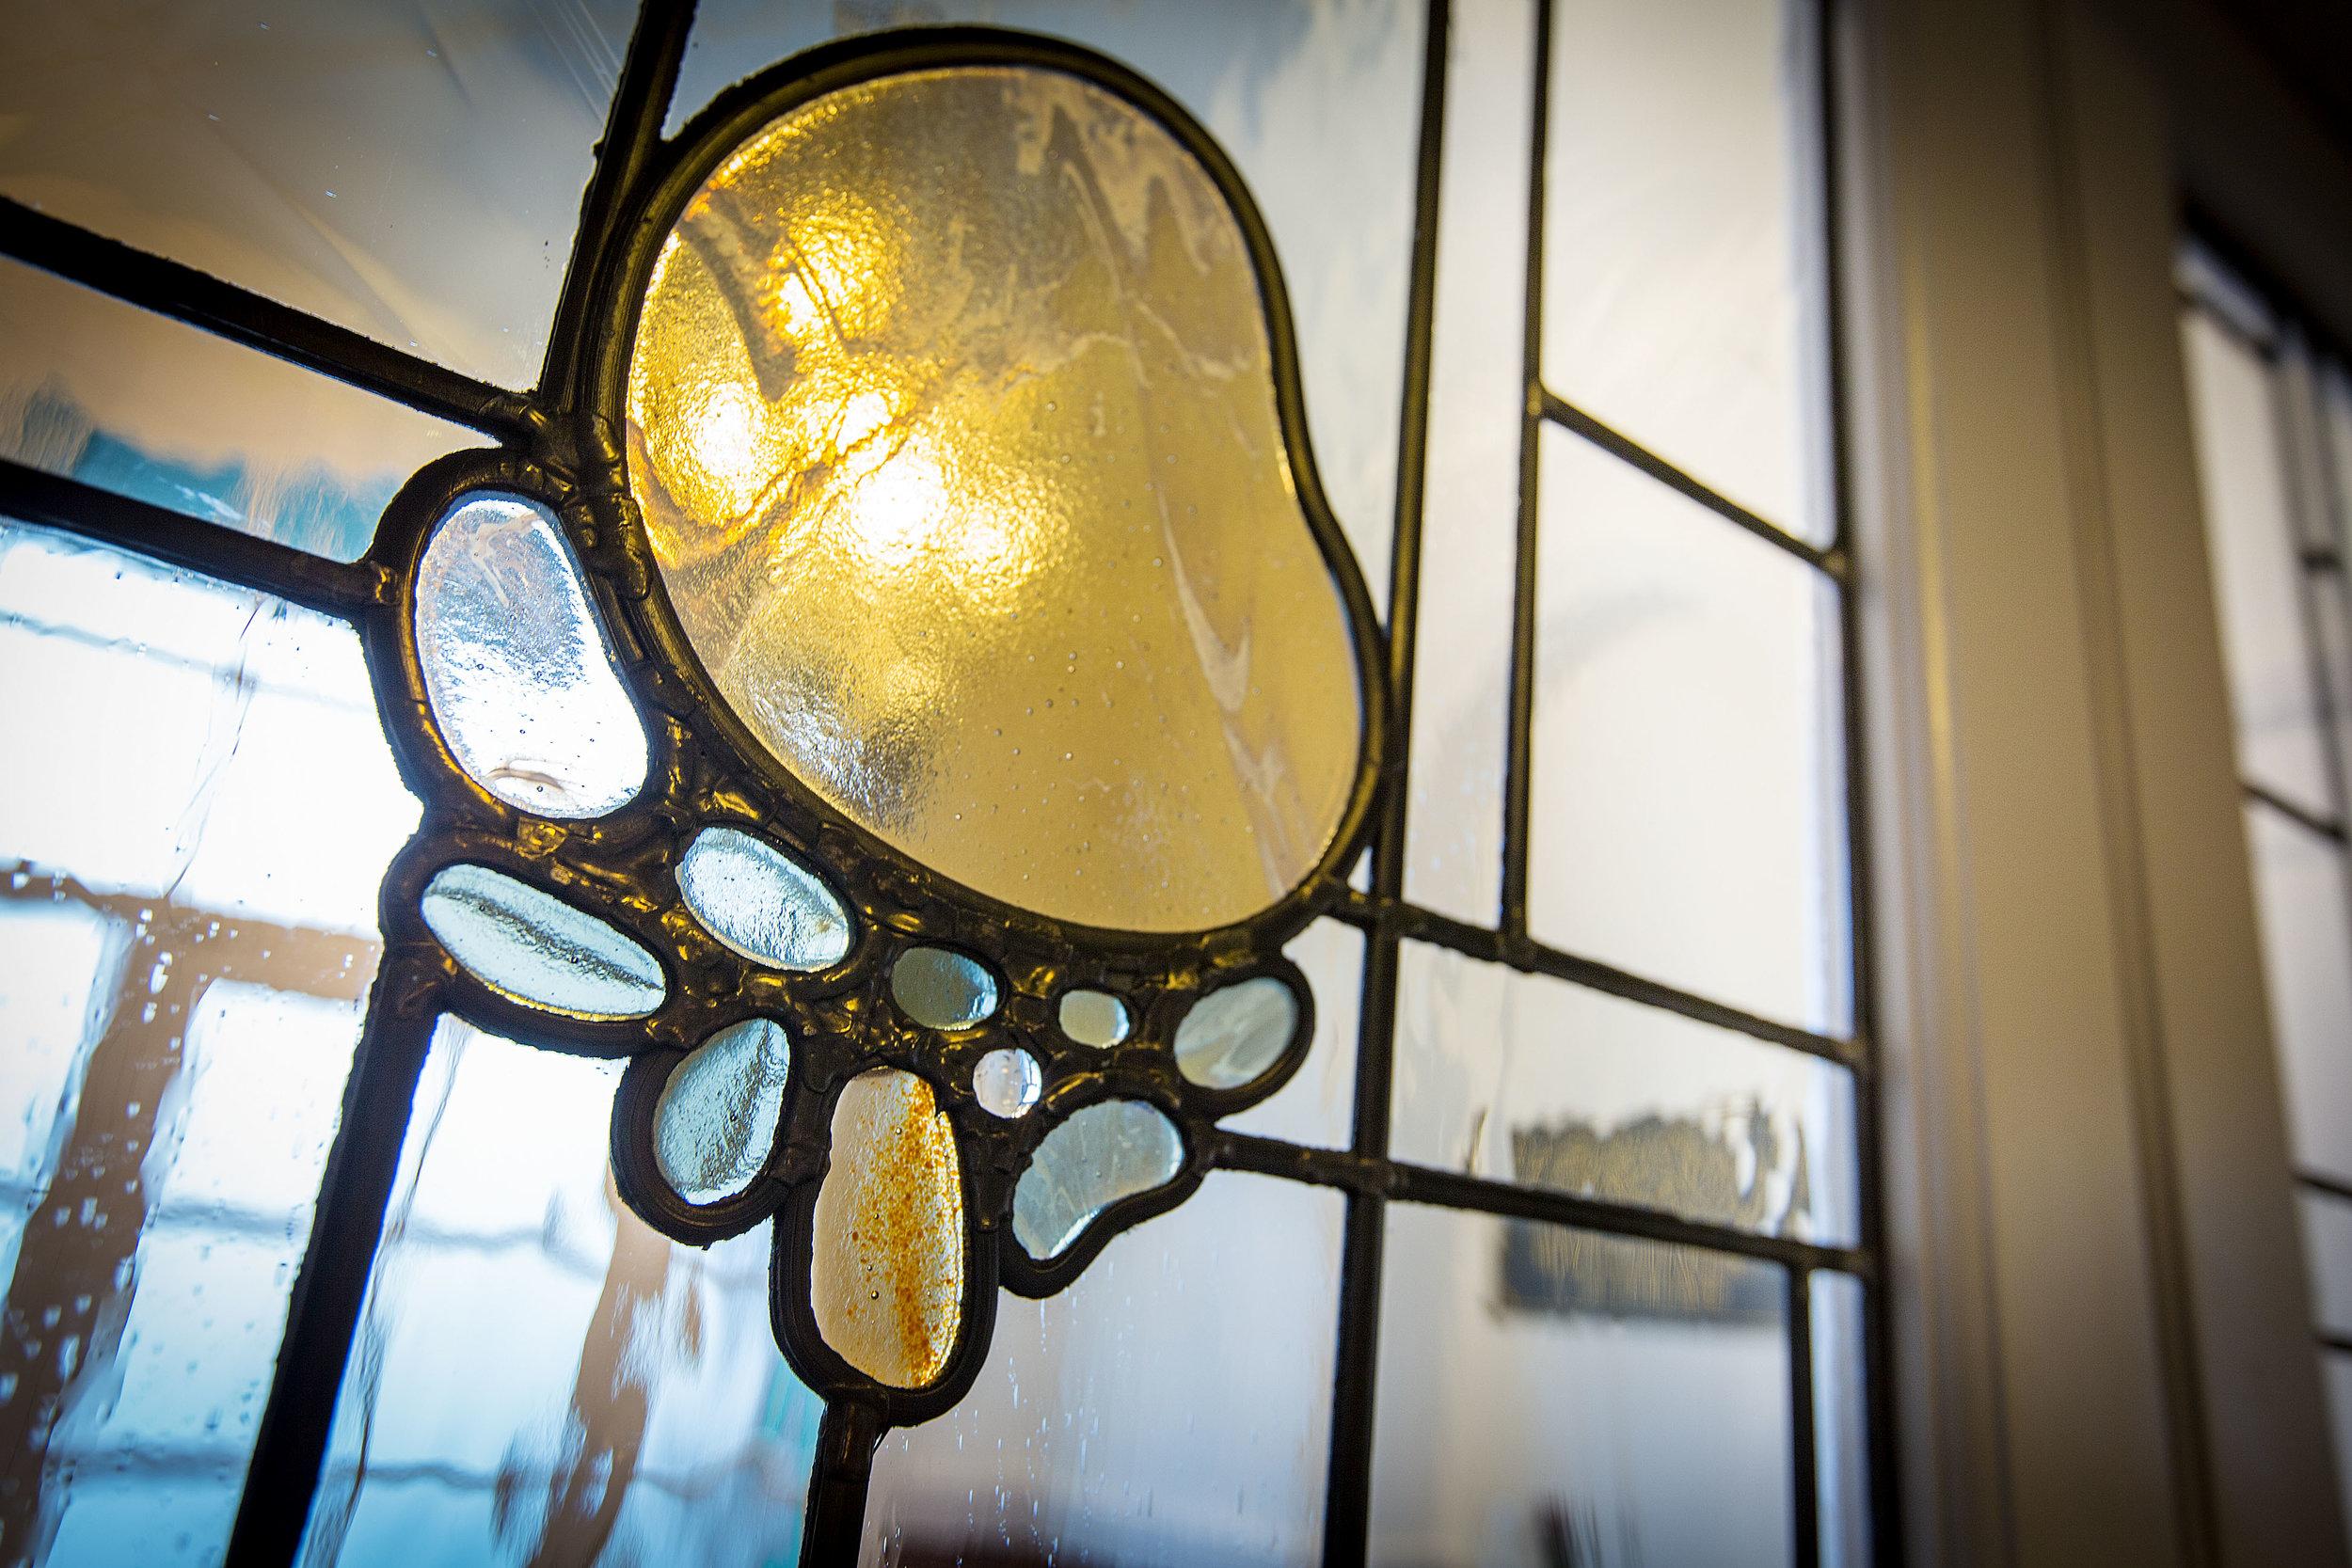 Little & Caine - Dalton, Cumbria - Bespoke Stained Glass Design